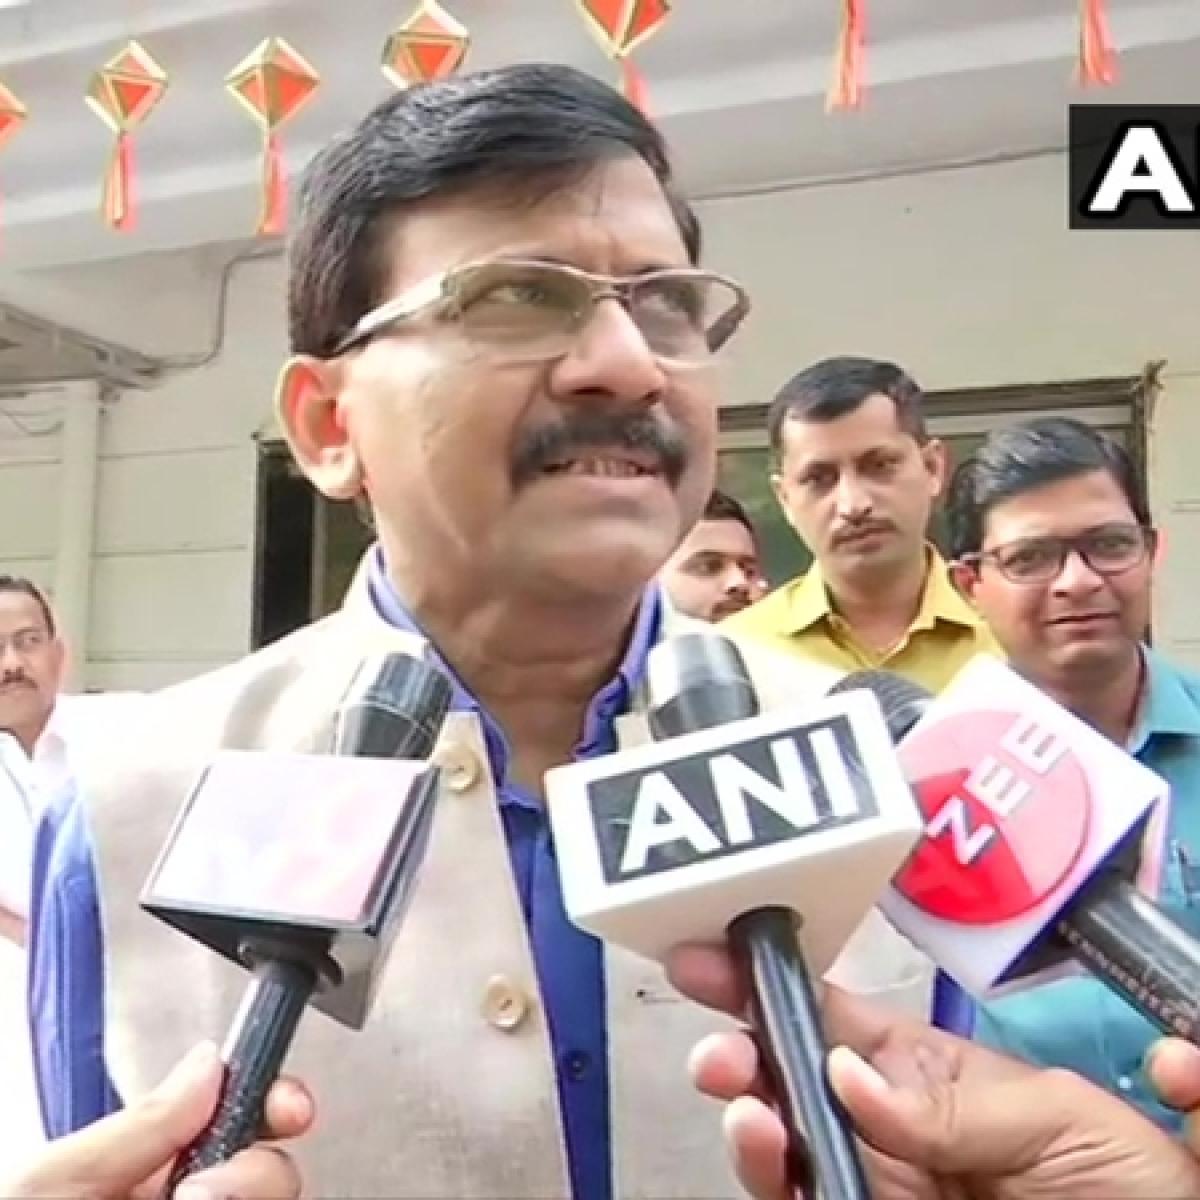 Chhatrapati Shivaji's descendants should clarify if they like Modi being compared to him: Sanjay Raut